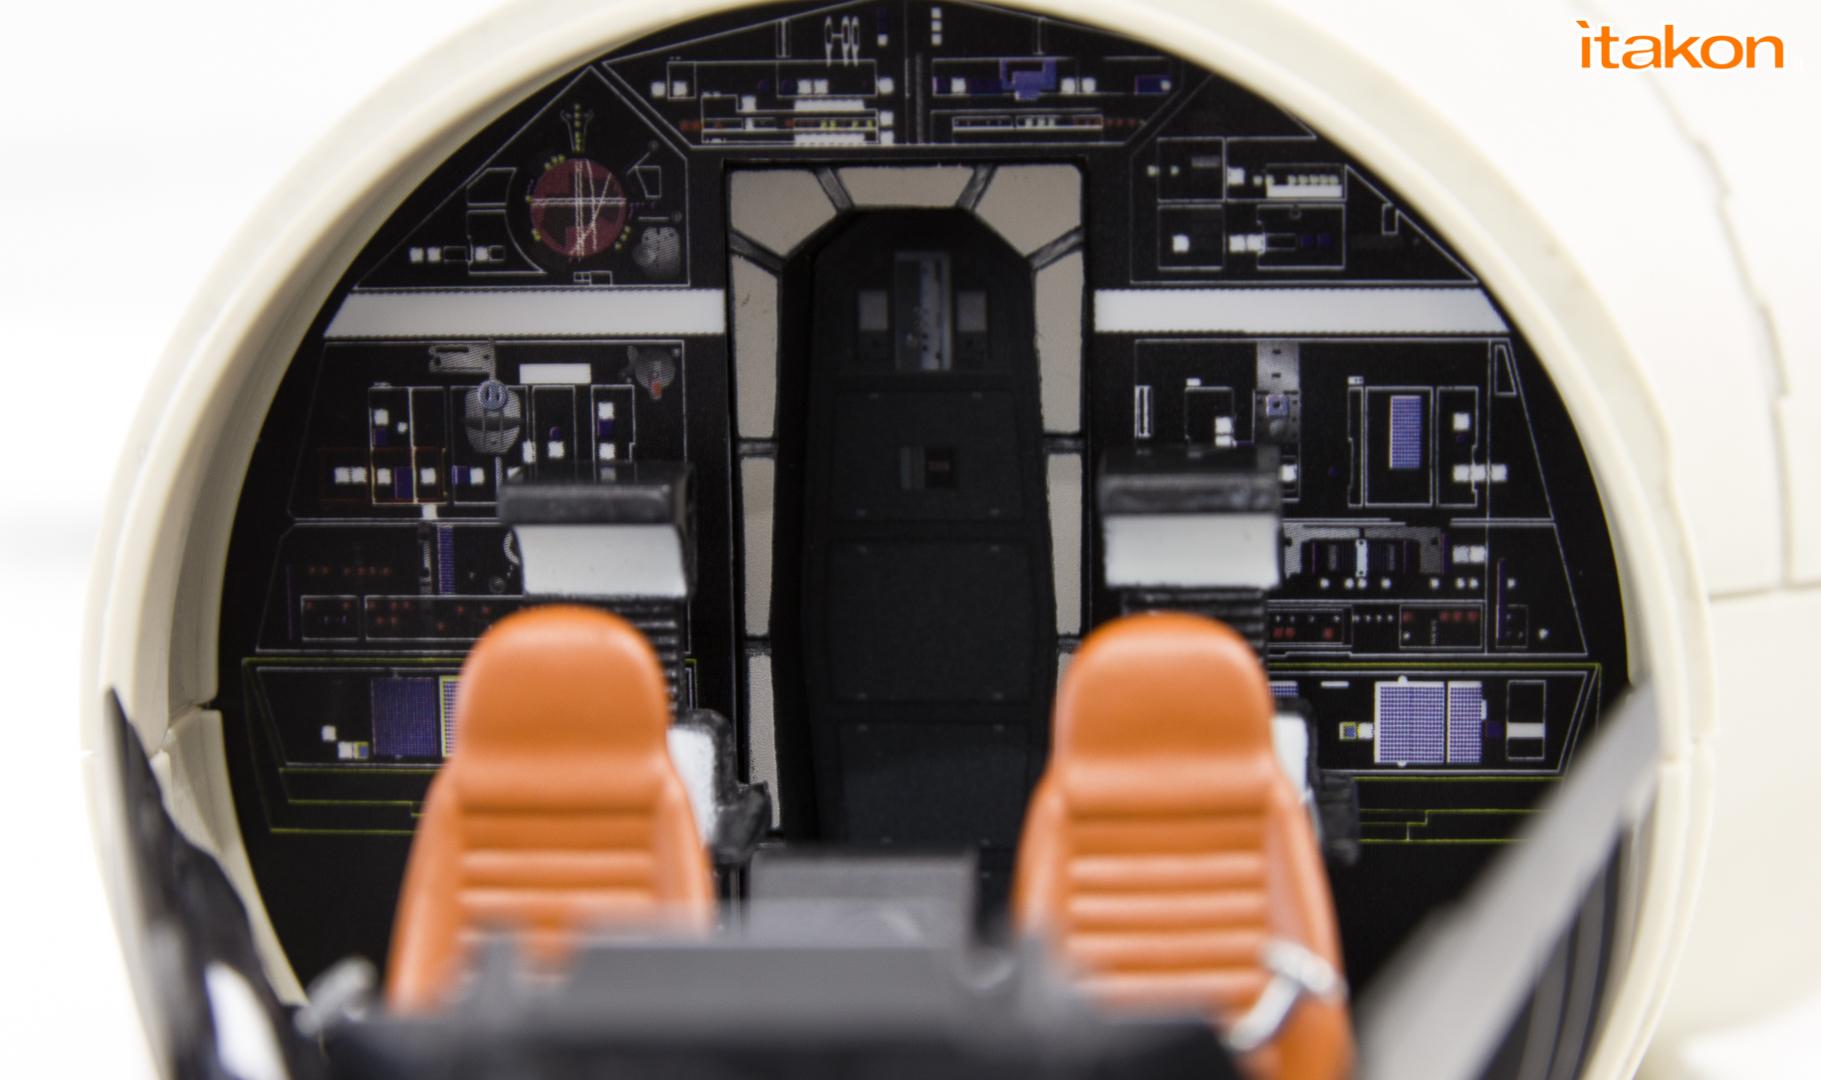 Link a De Agostini ModelSpace Millenniun Falcon Itakon Anktales-36